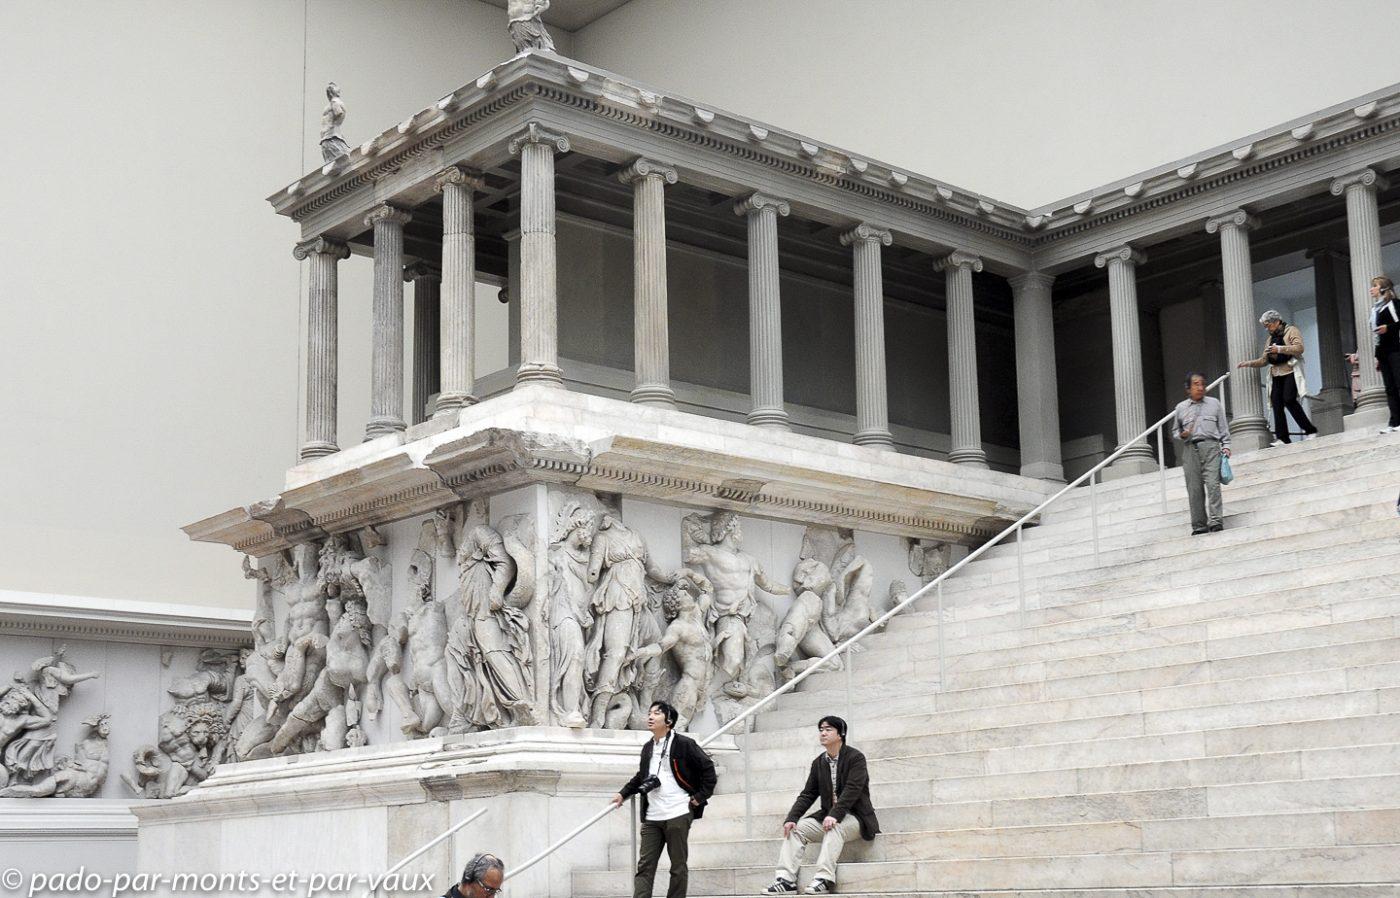 2009 Berlin - Pergamon